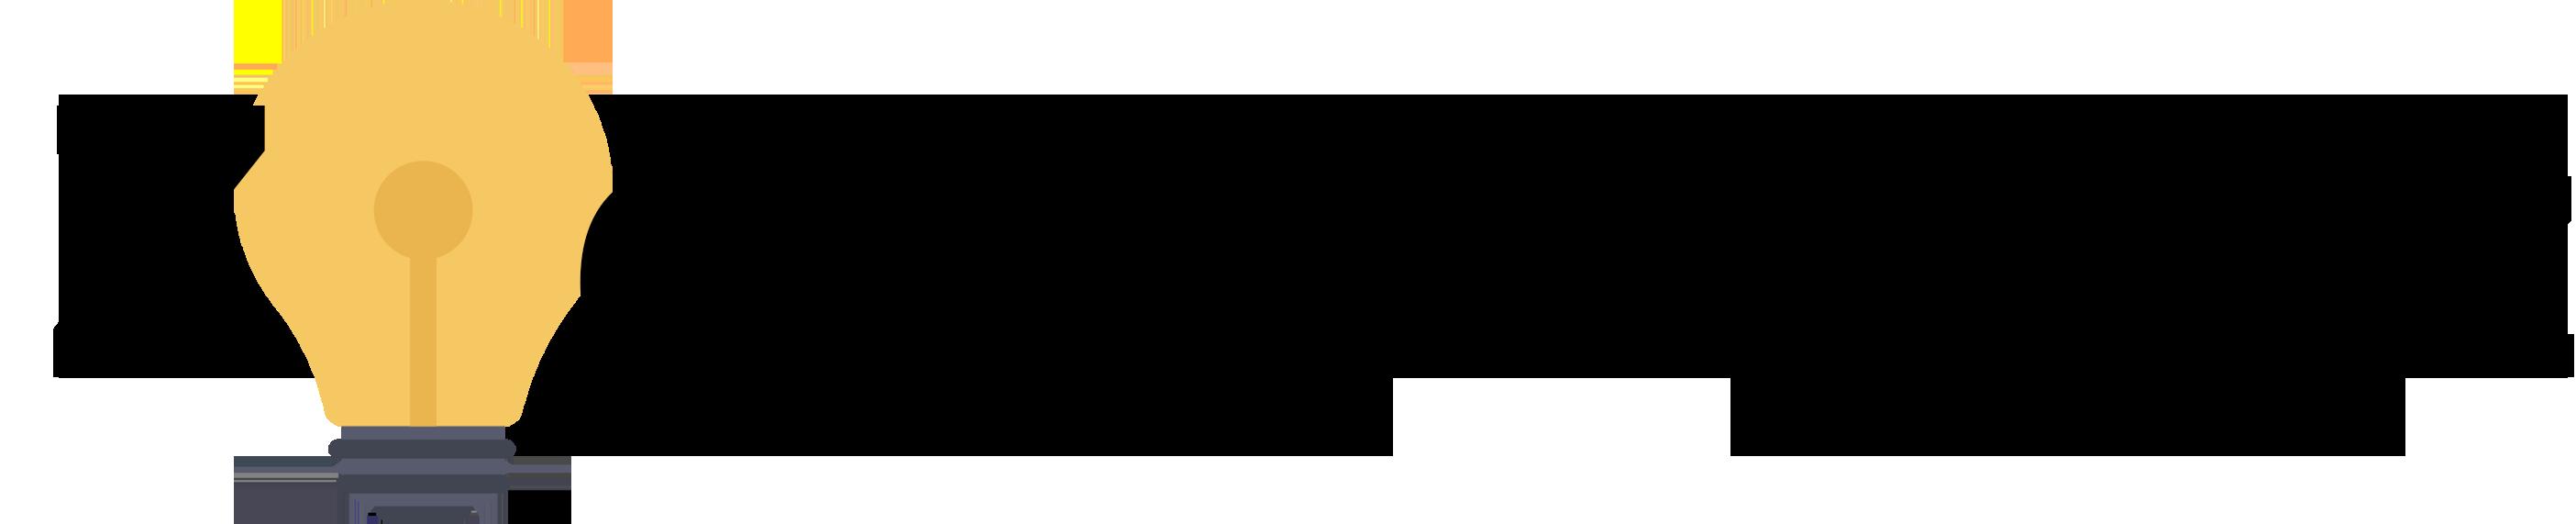 Zodpovime.cz Logo